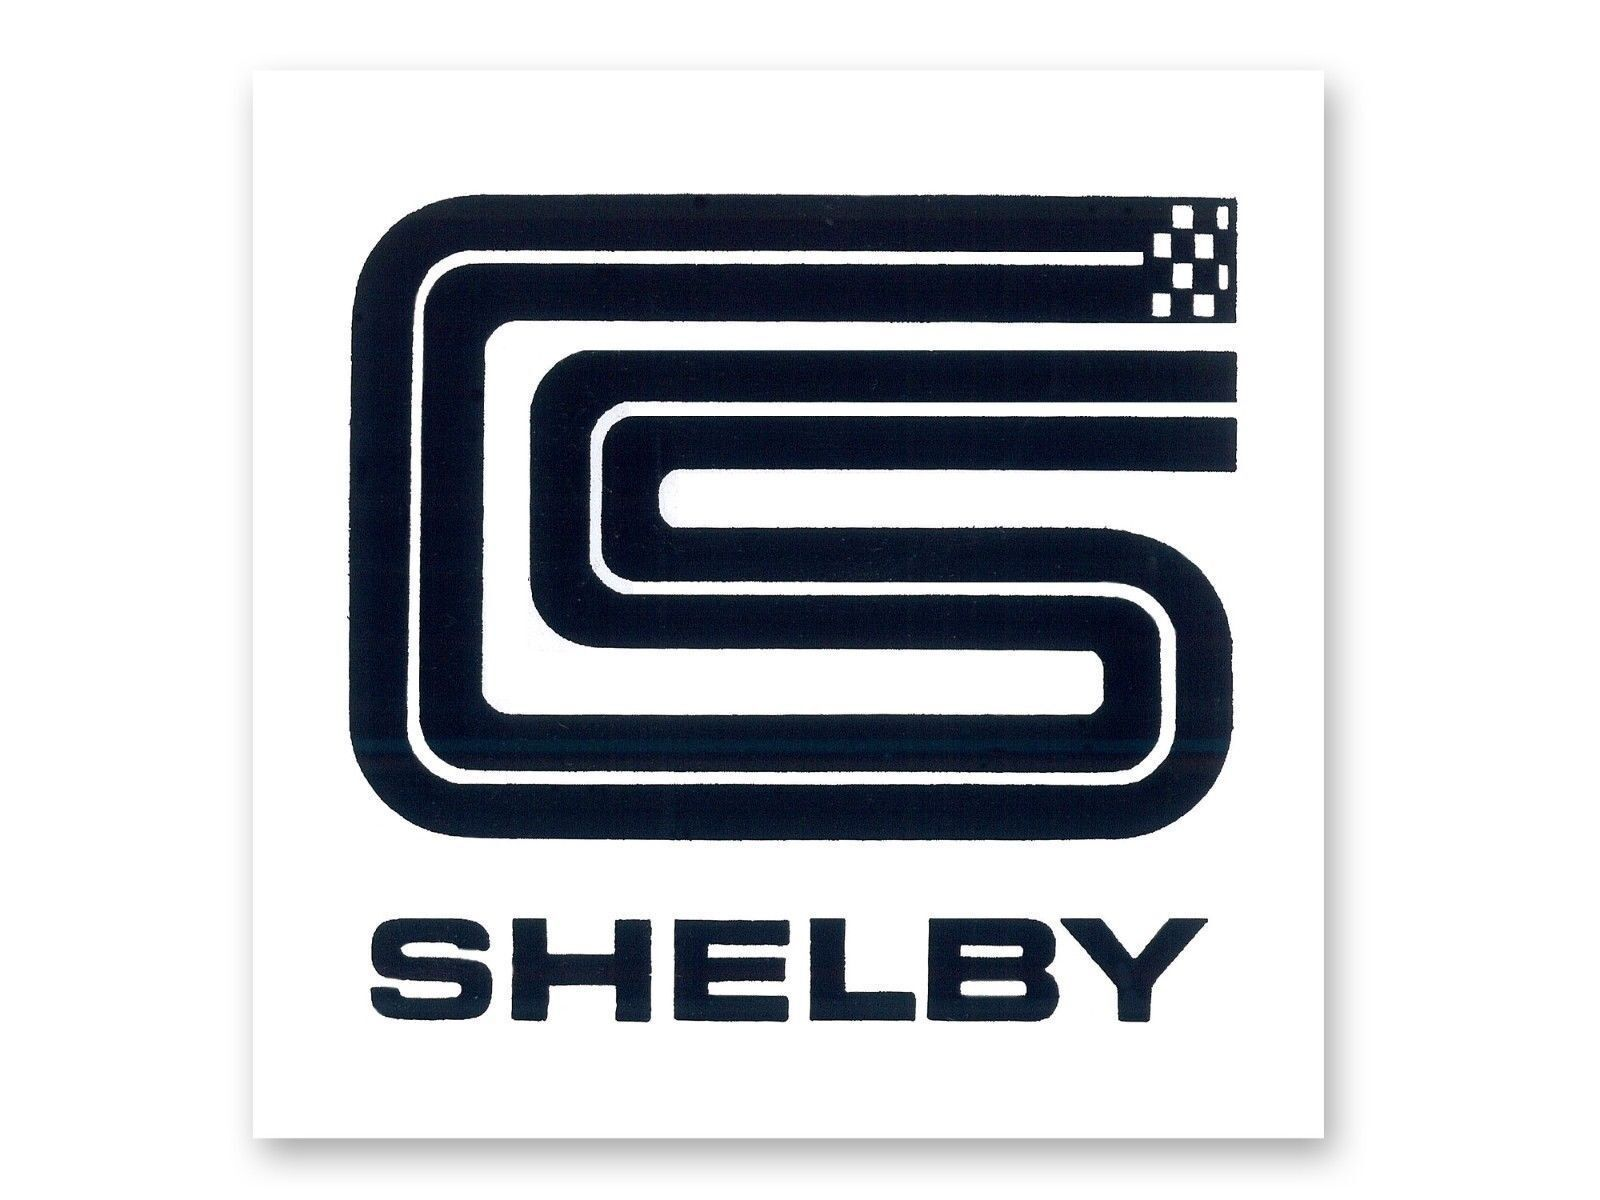 club cobra carroll shelby cs logo vinyl graphic